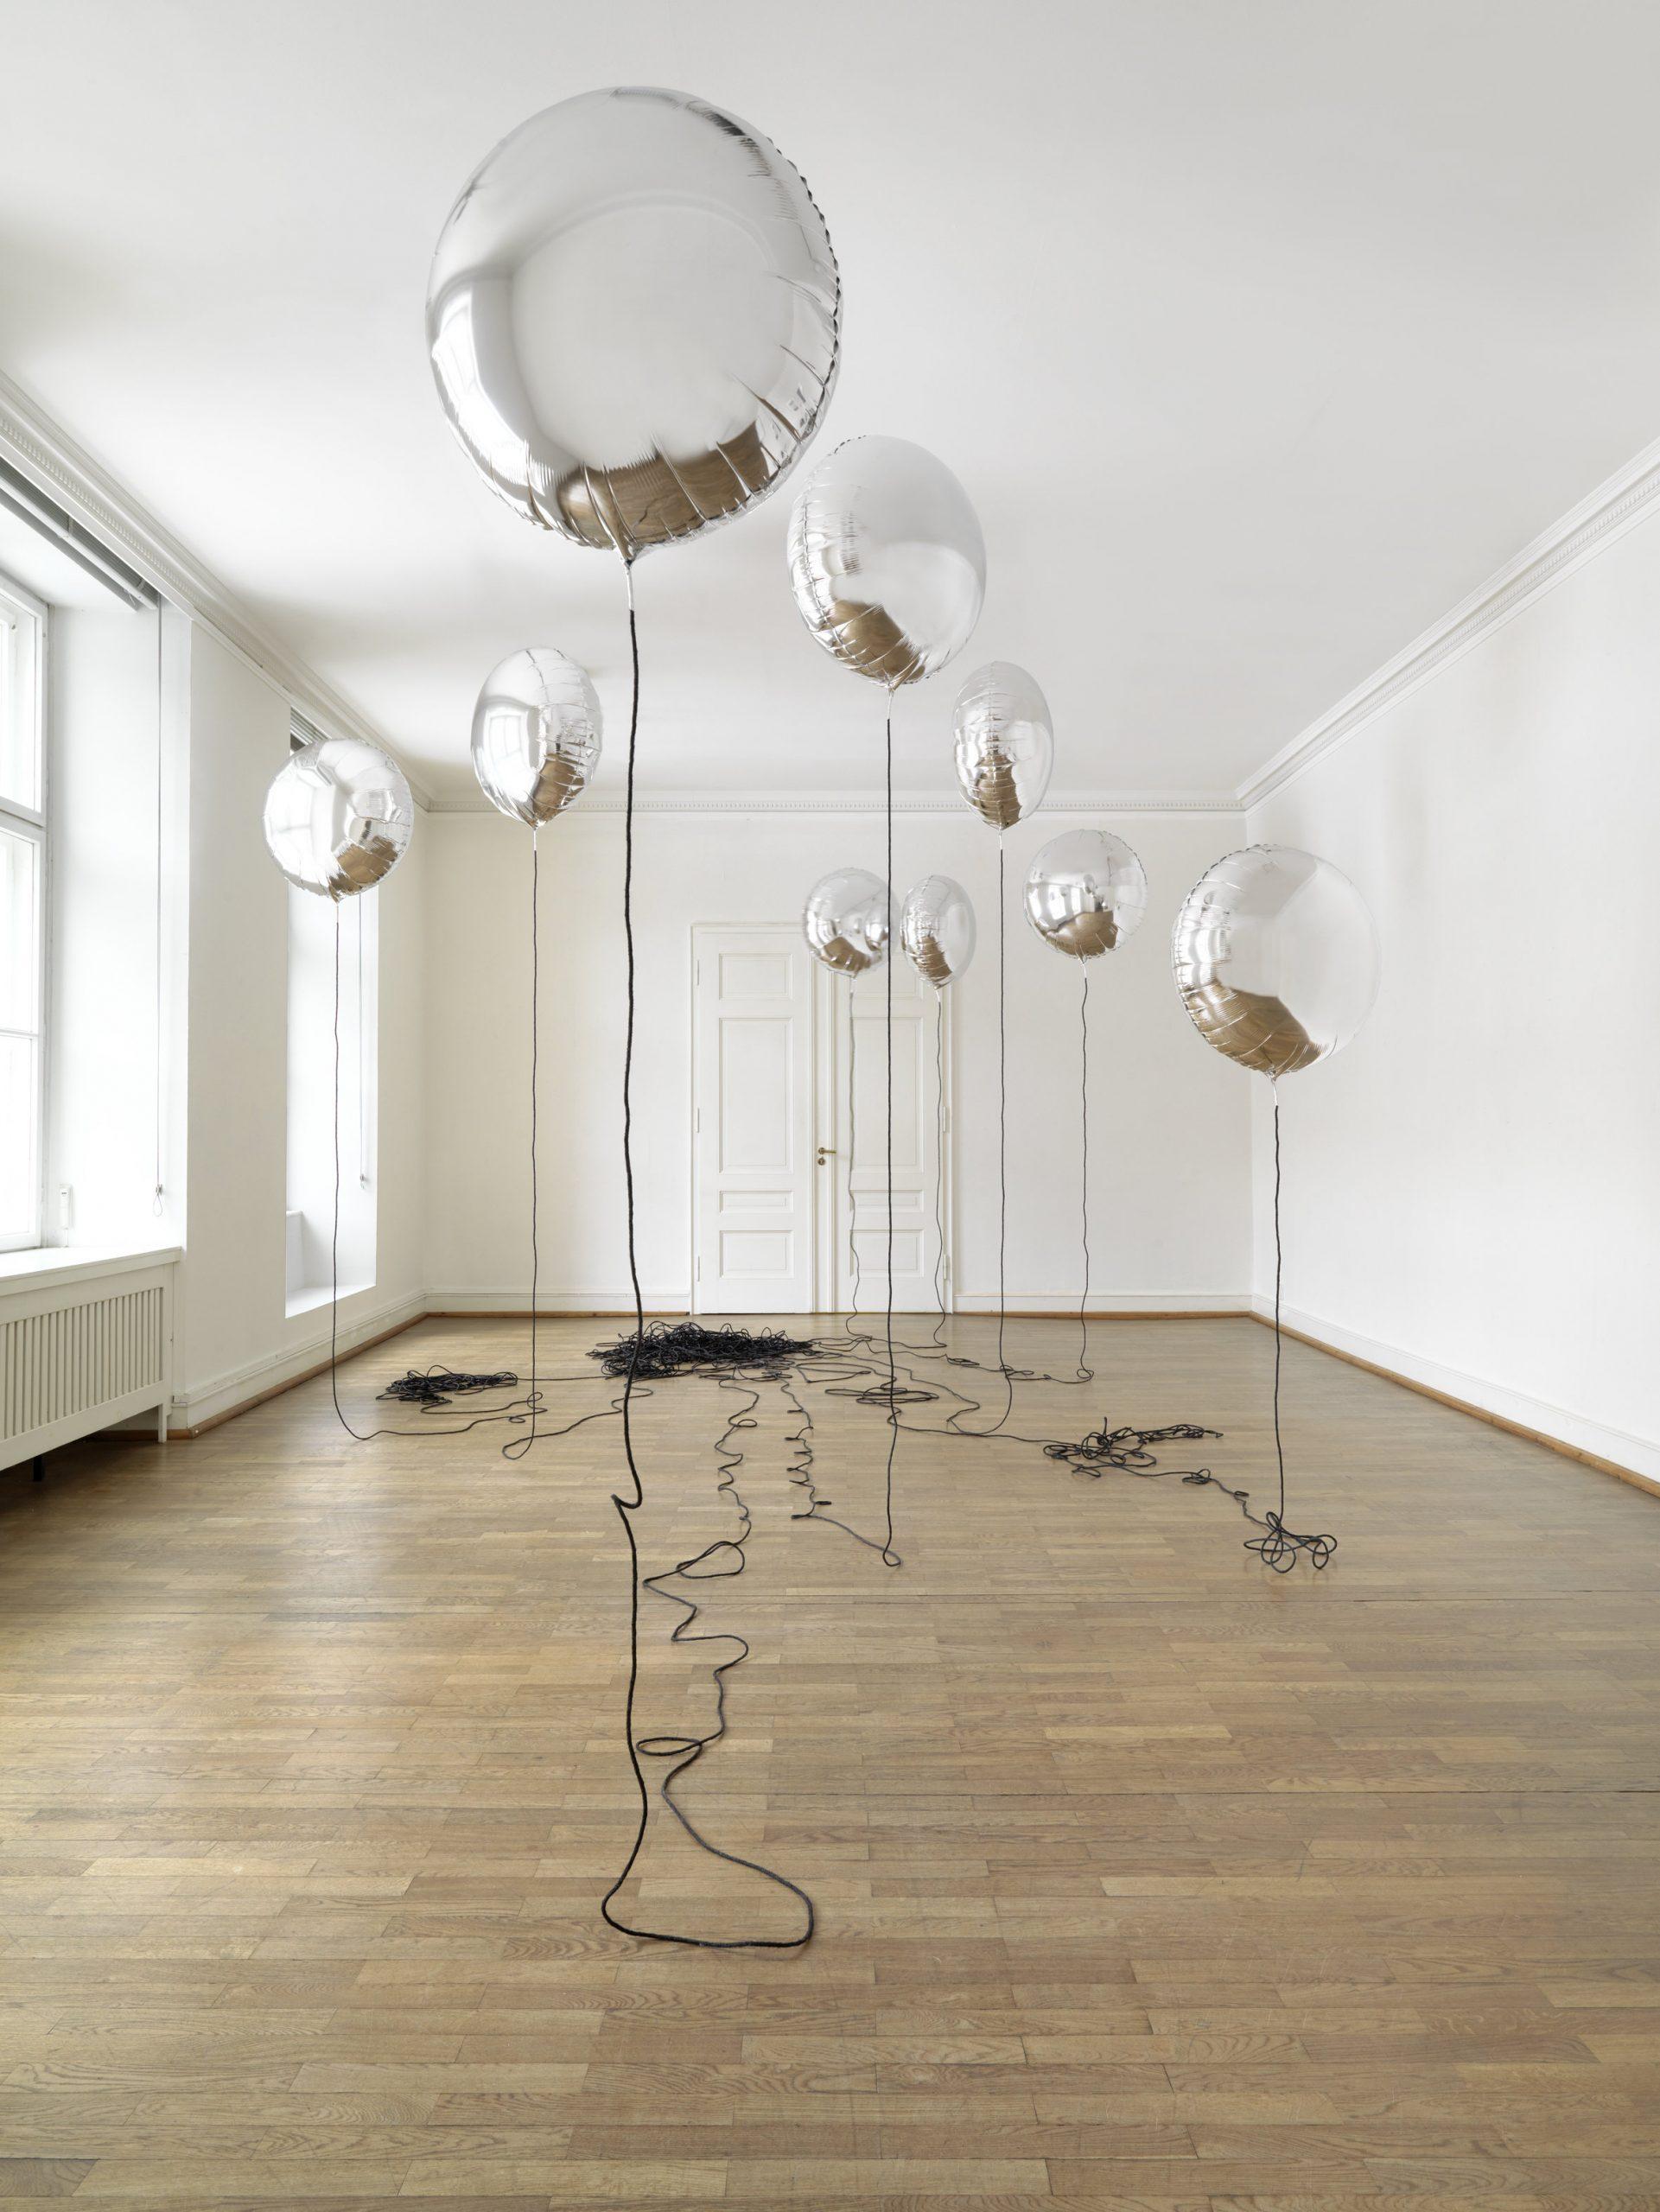 Anke Mila Menck L & A, 2012